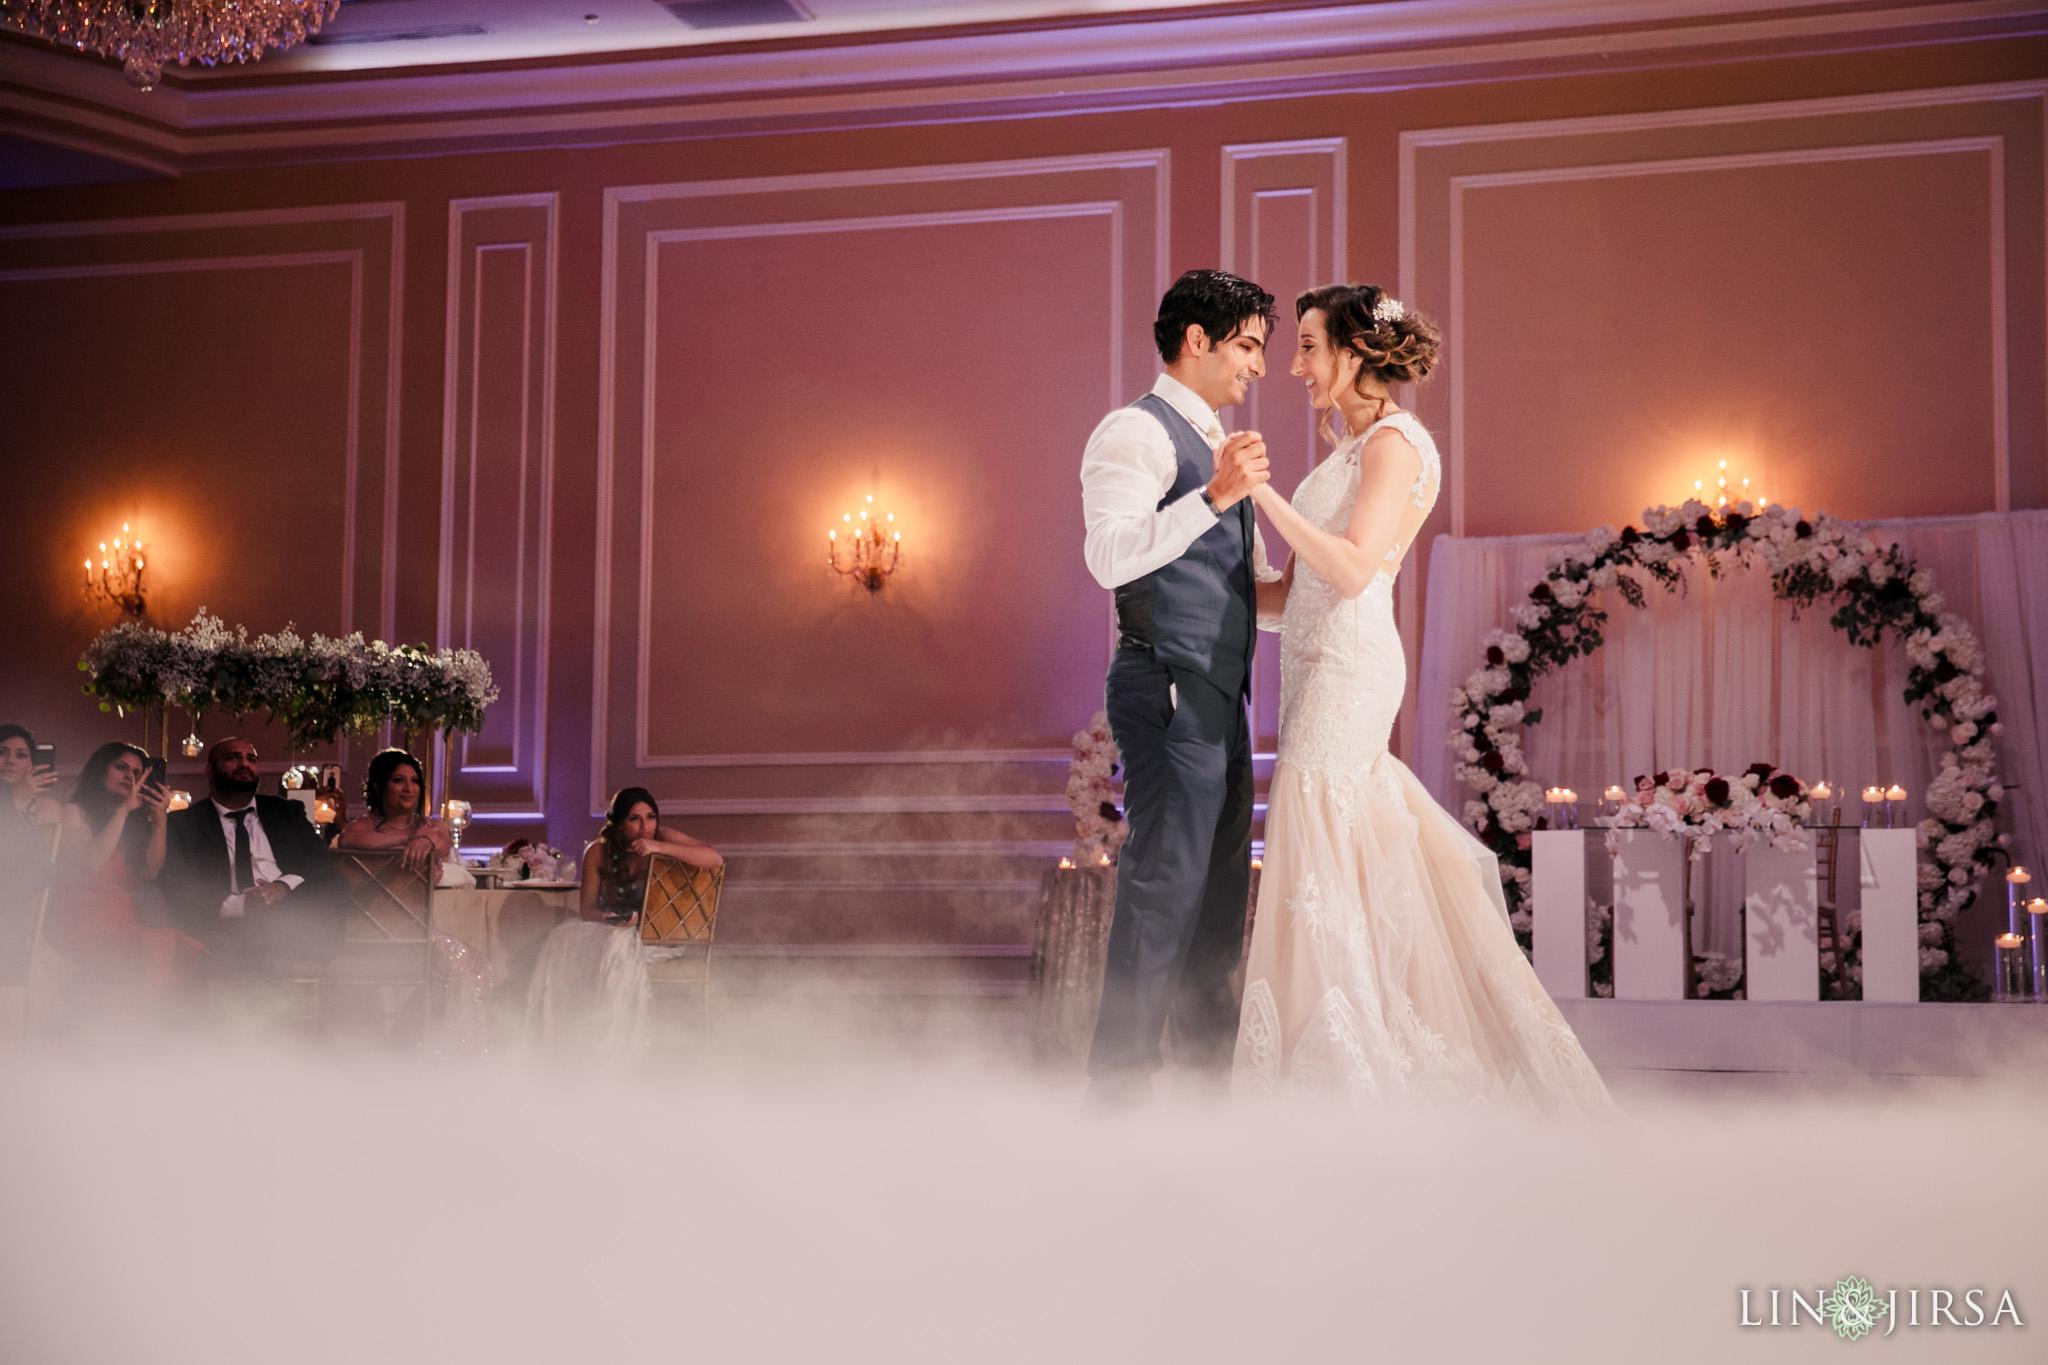 026 taglyan complex los angeles persian wedding photography